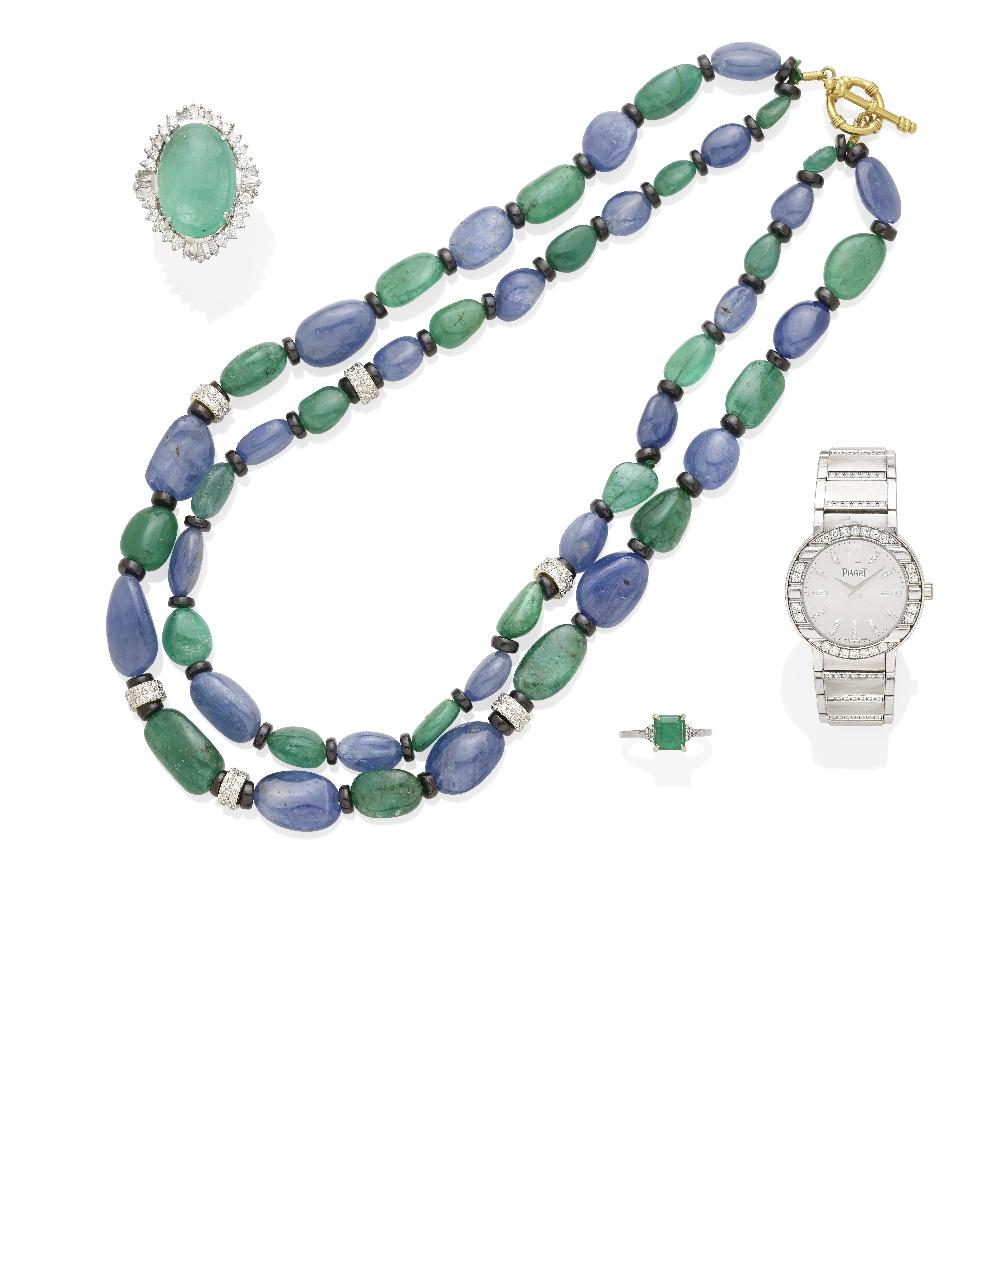 Lot 36 - A Lady's Diamond and 18k White Gold 'Polo' Bracelet Watch, Piaget